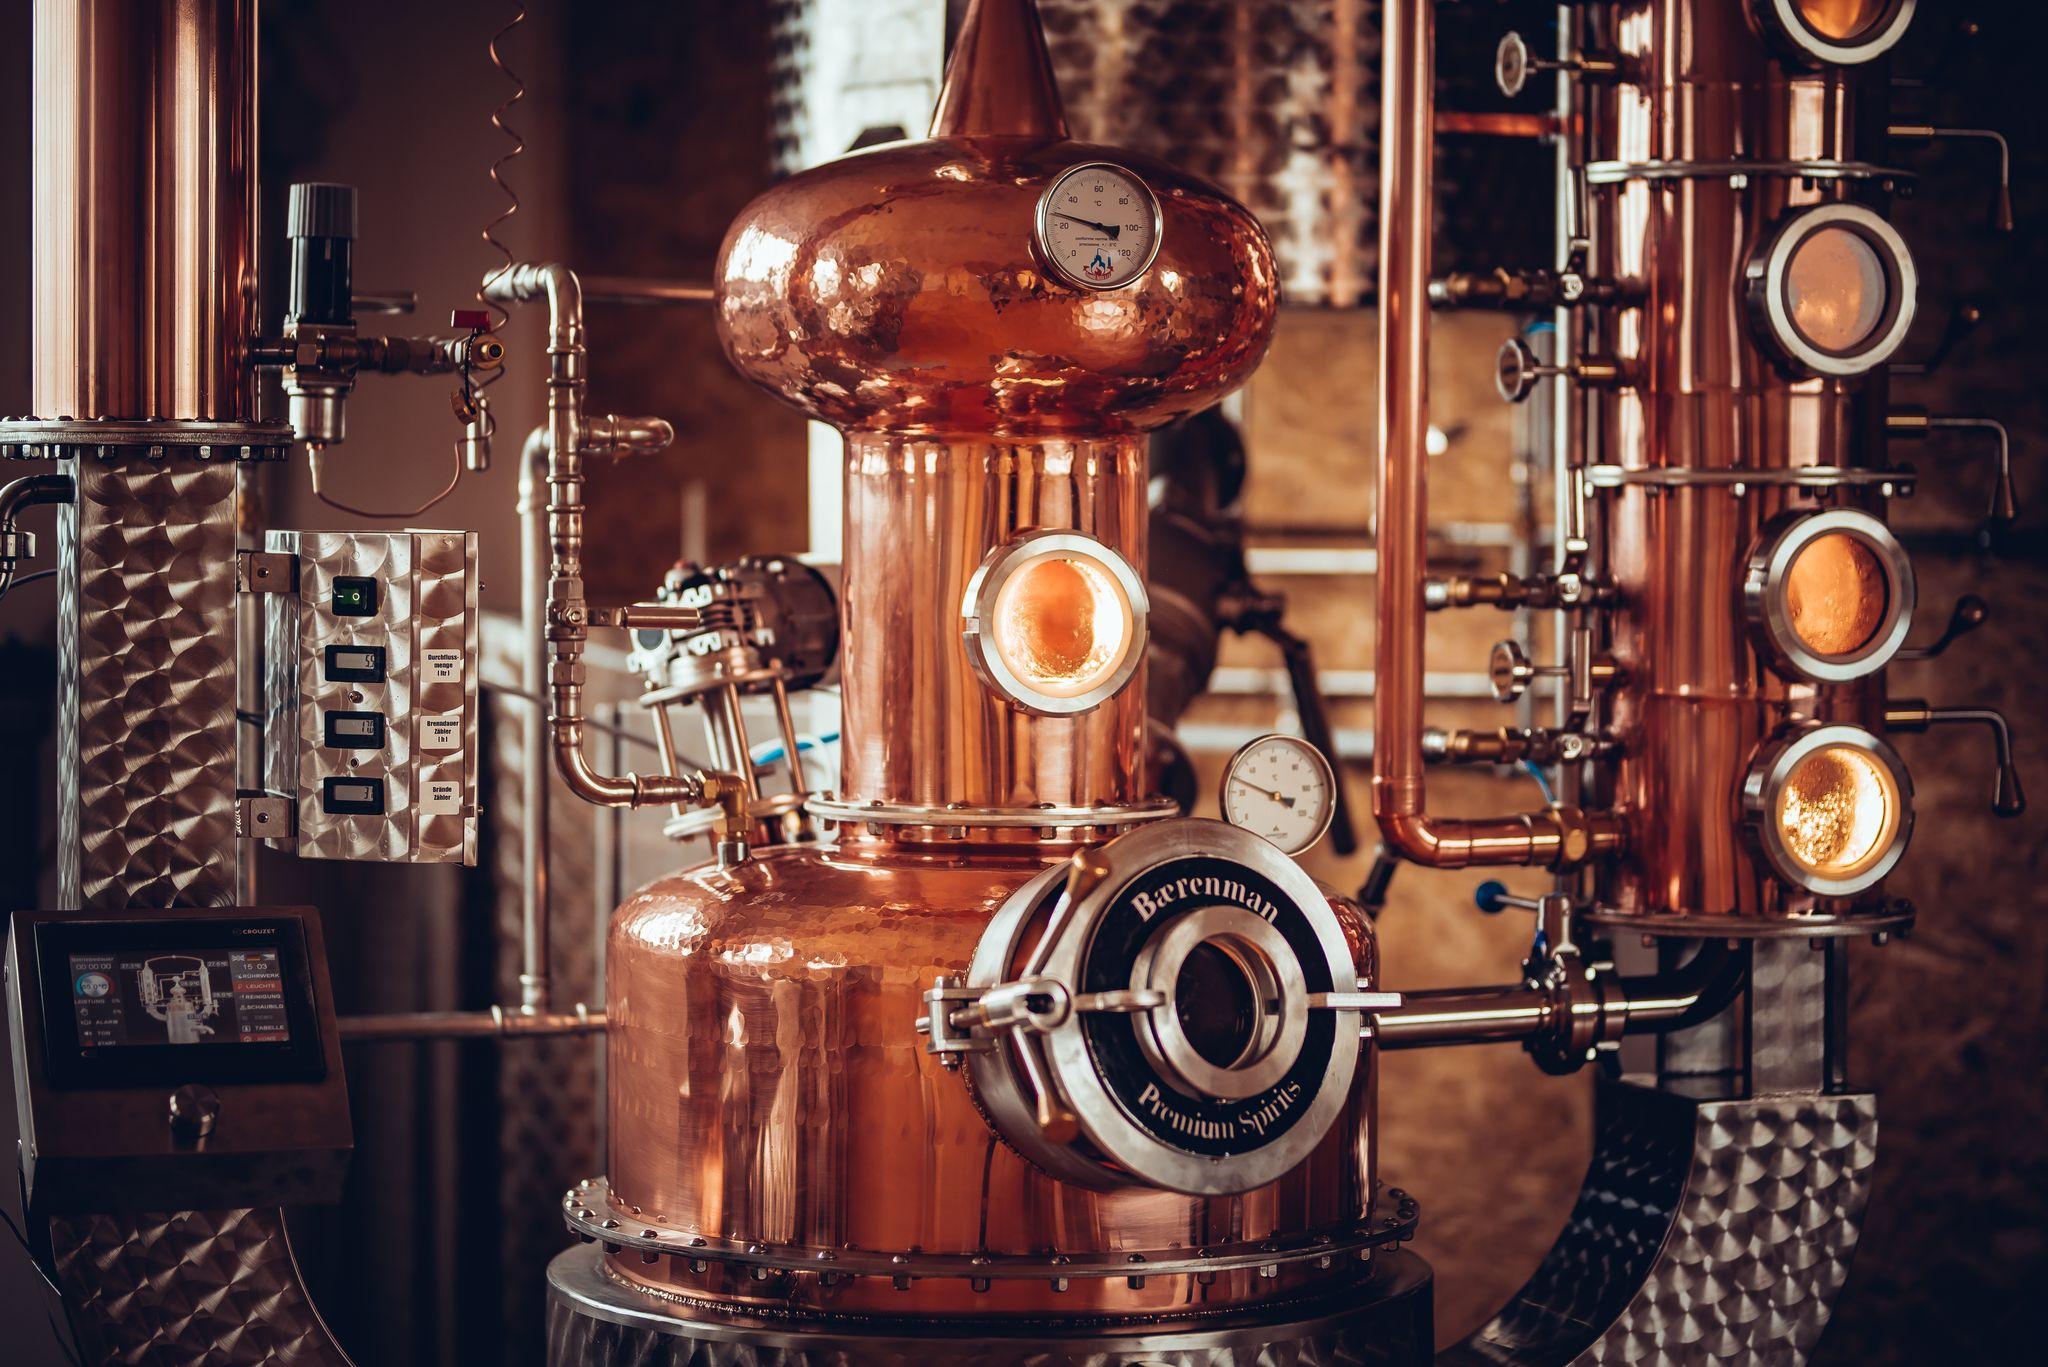 Baerenman Distillery System